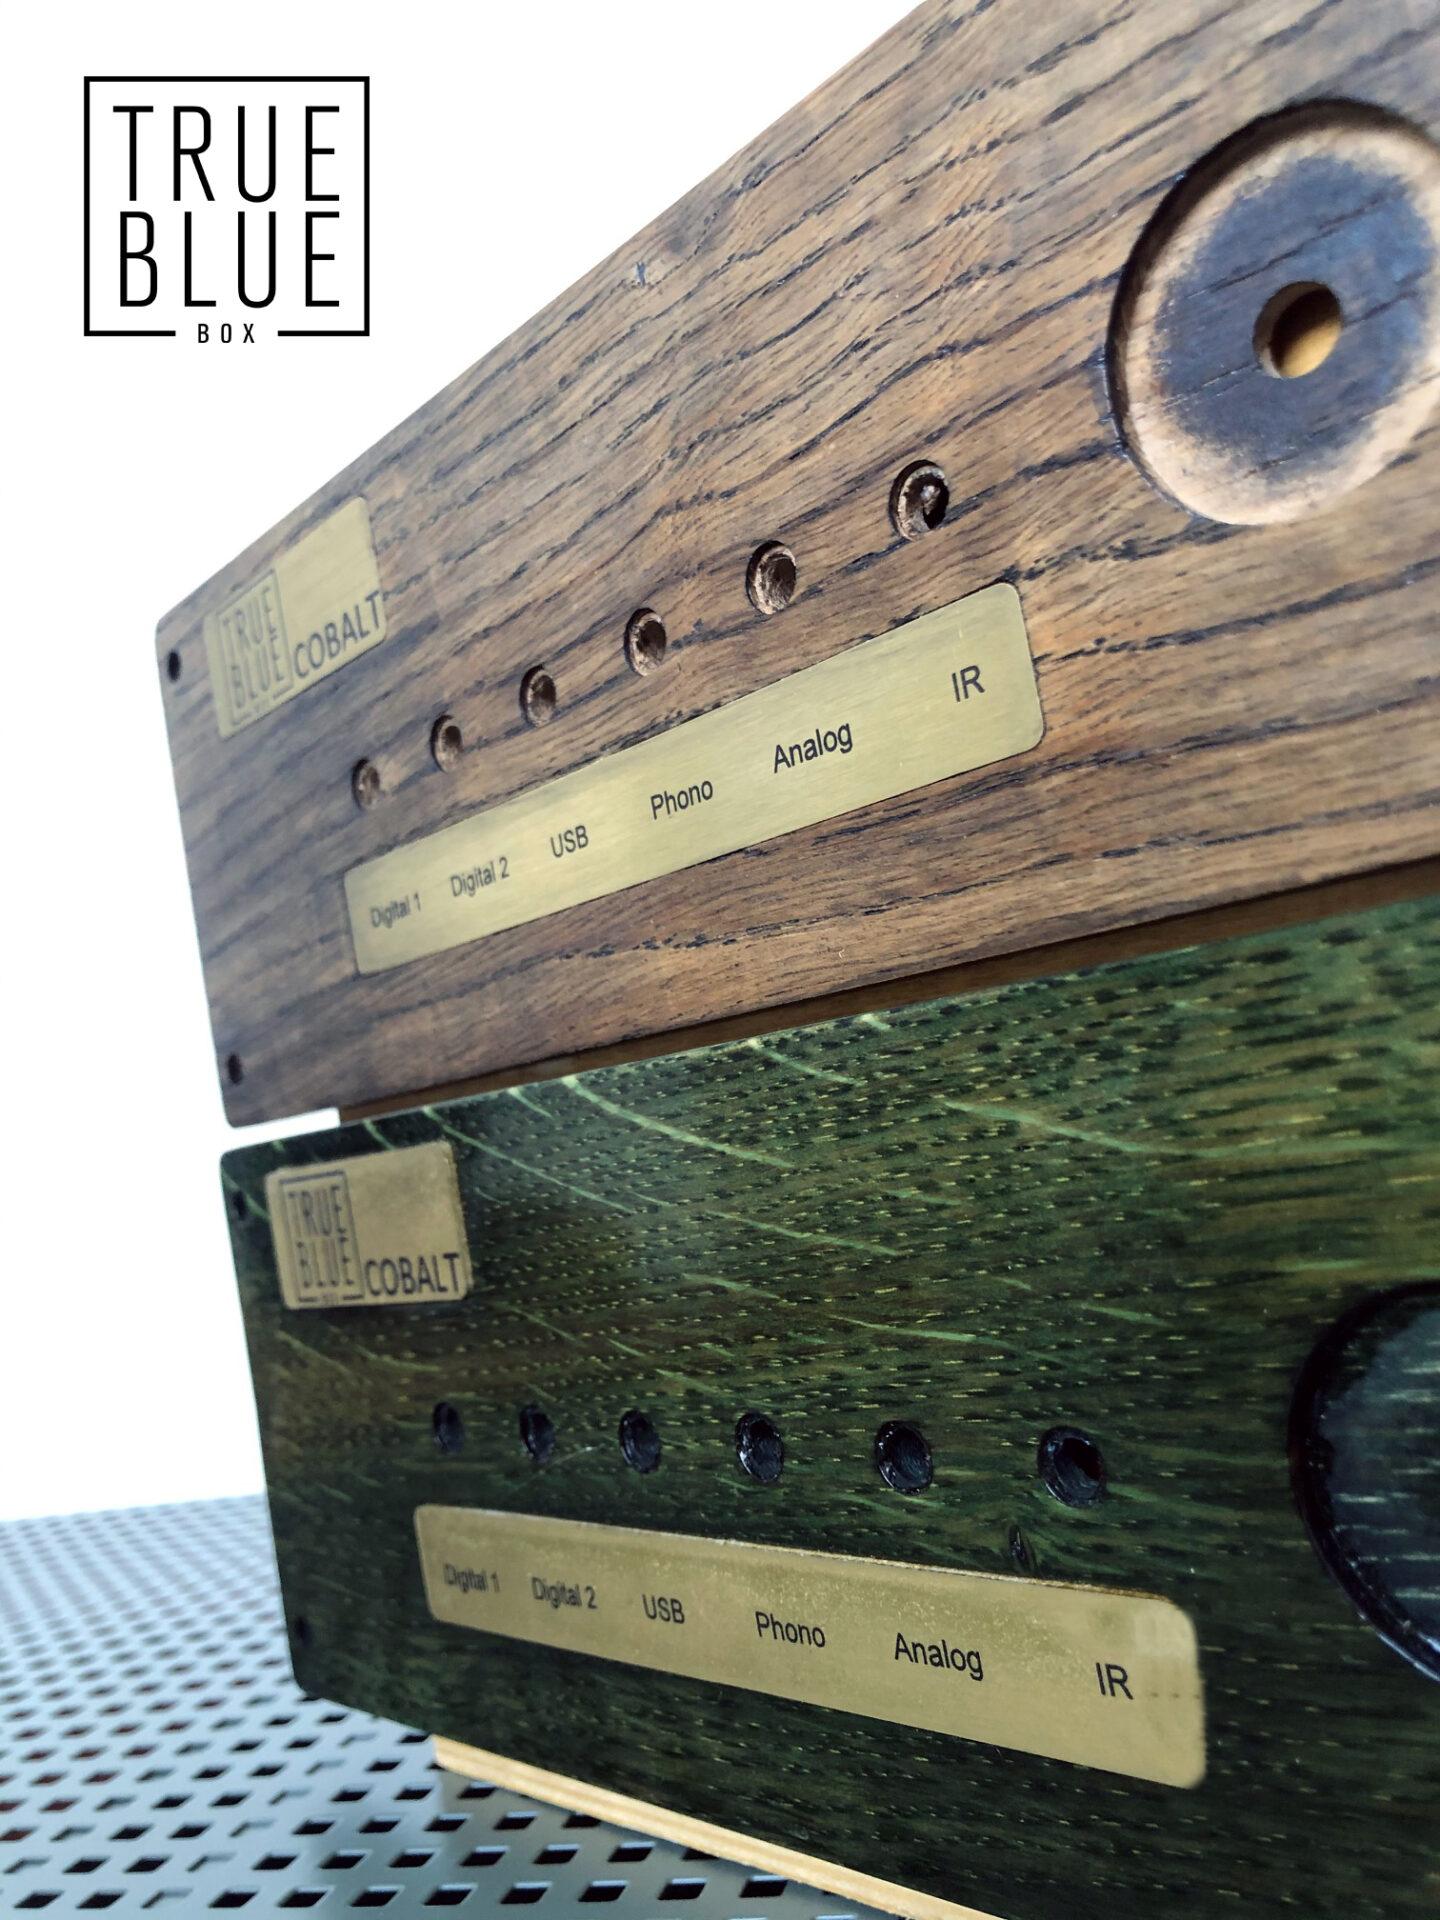 True Blue Box COBALT DA 15